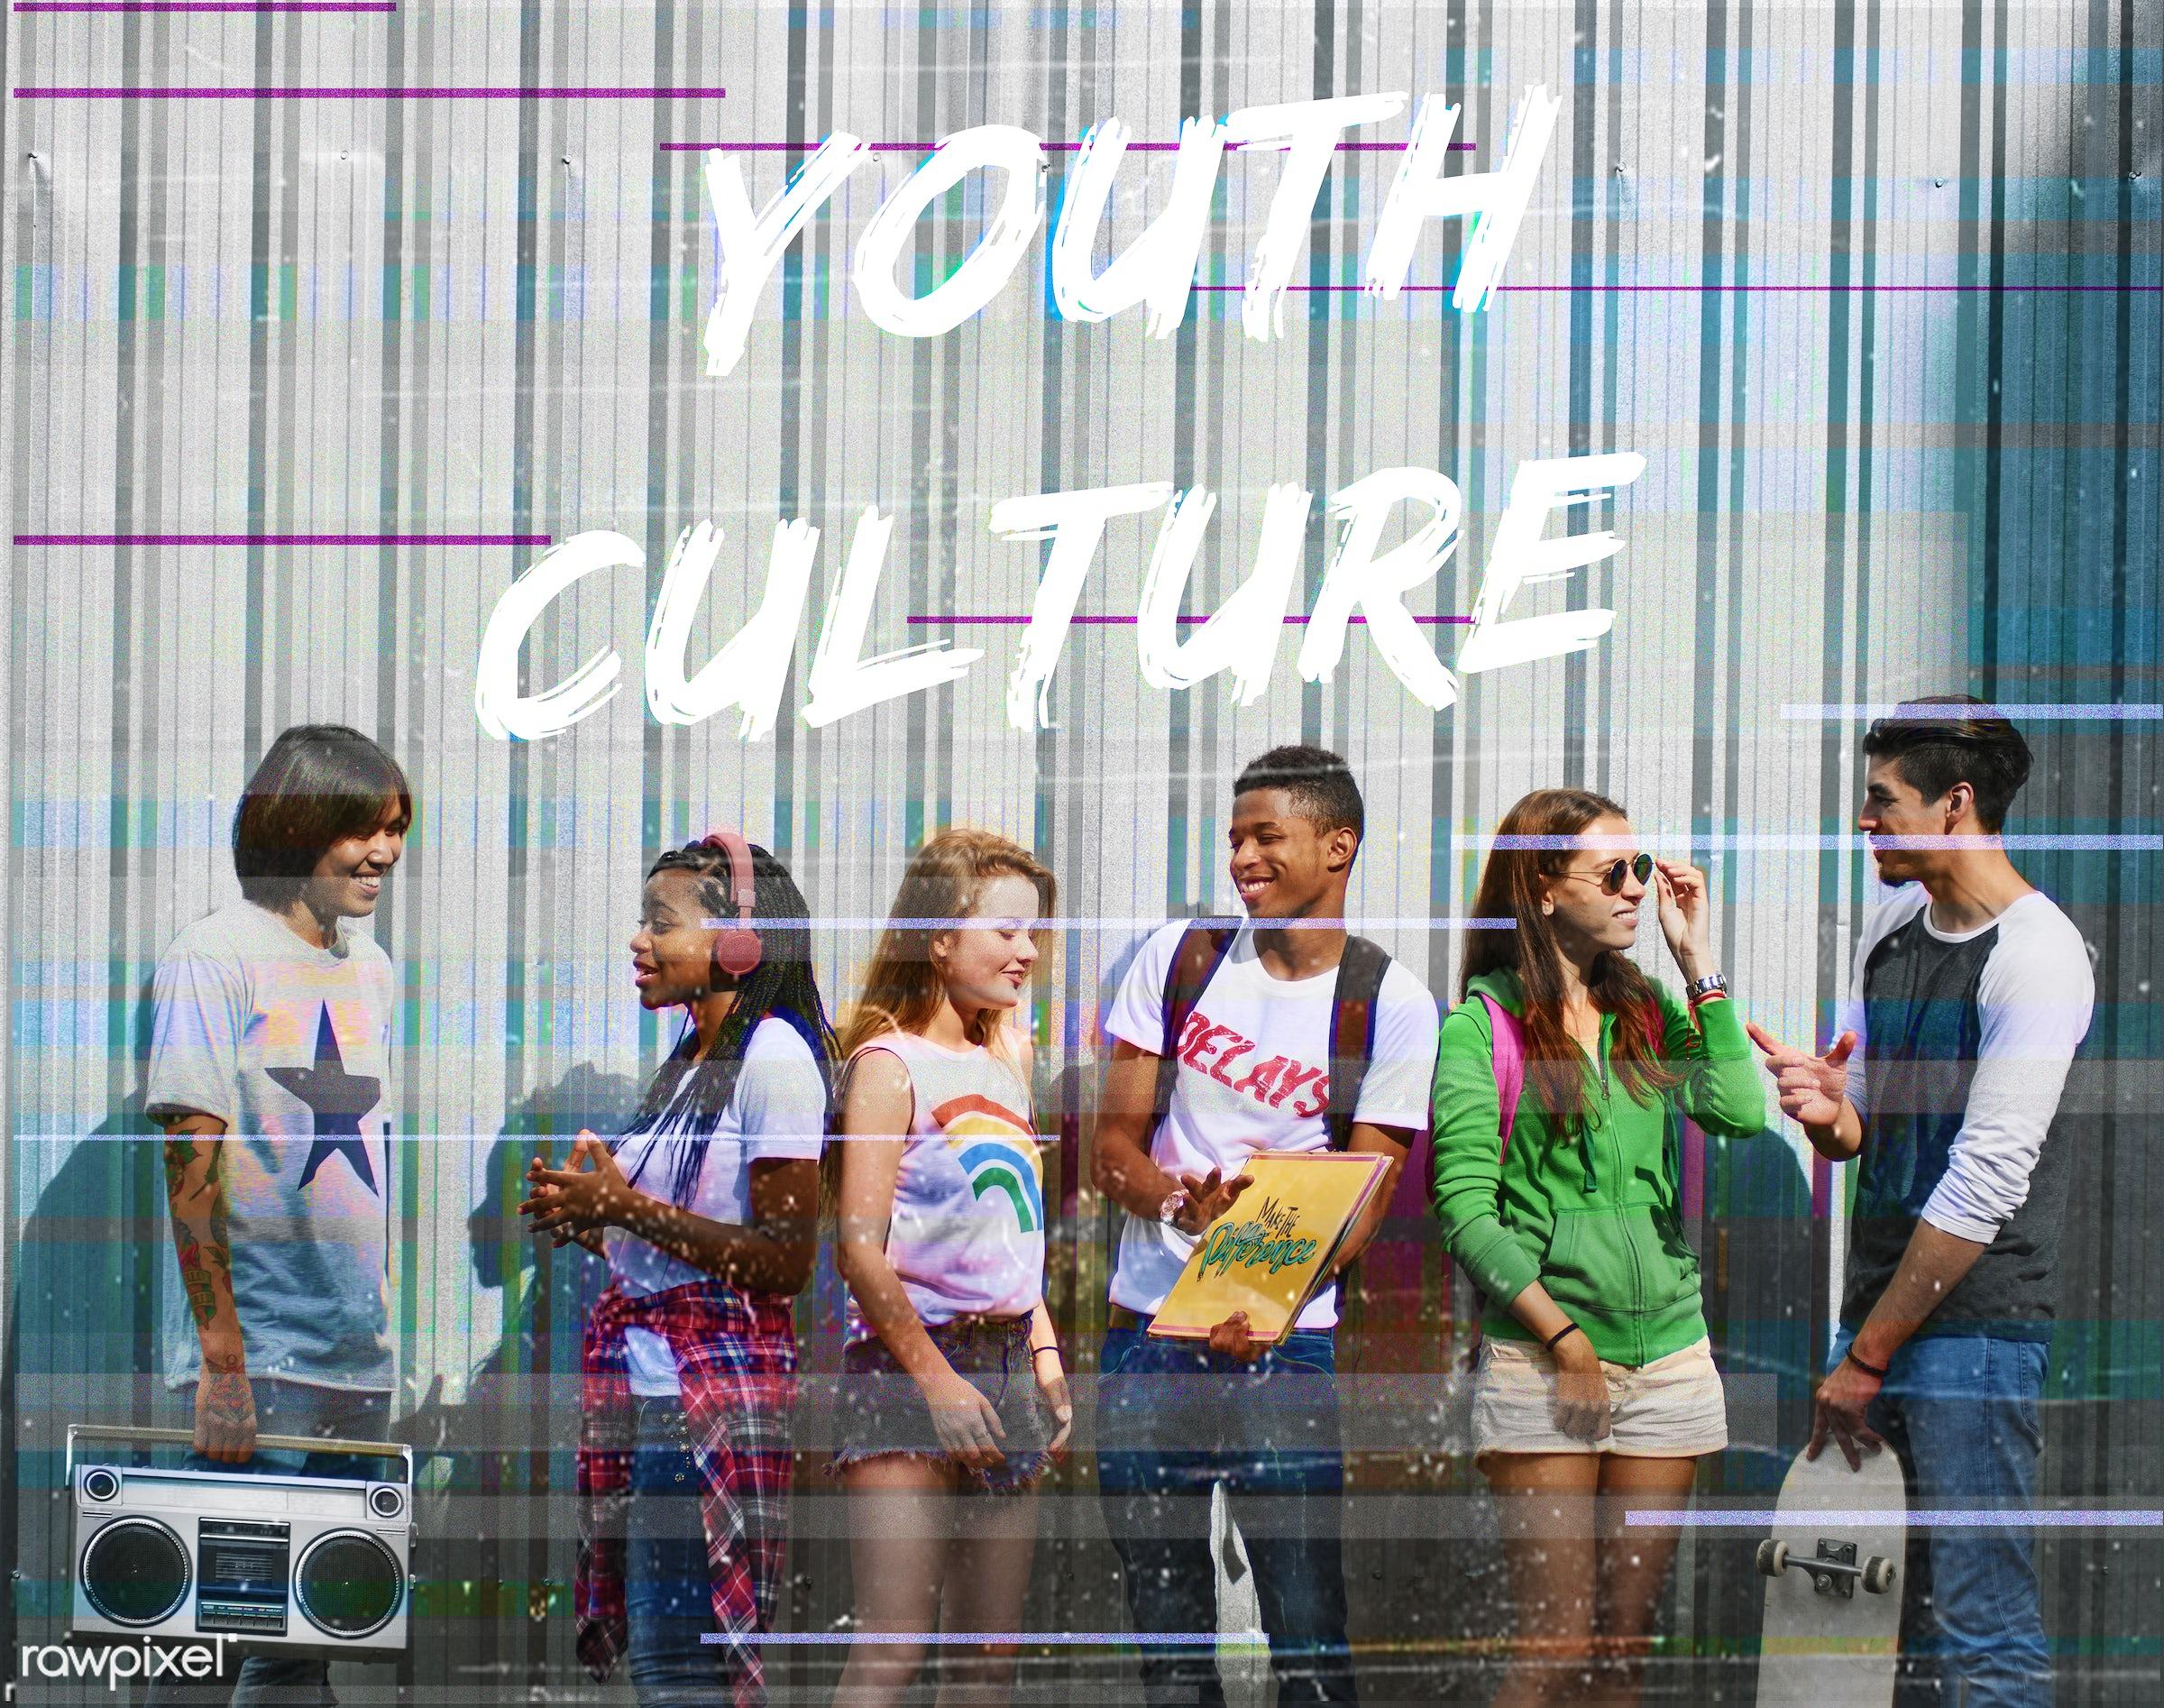 caucasian, african descent, asian, community, culture, diversity, enjoyment, entertain, flexibility, free, freedom, friends...